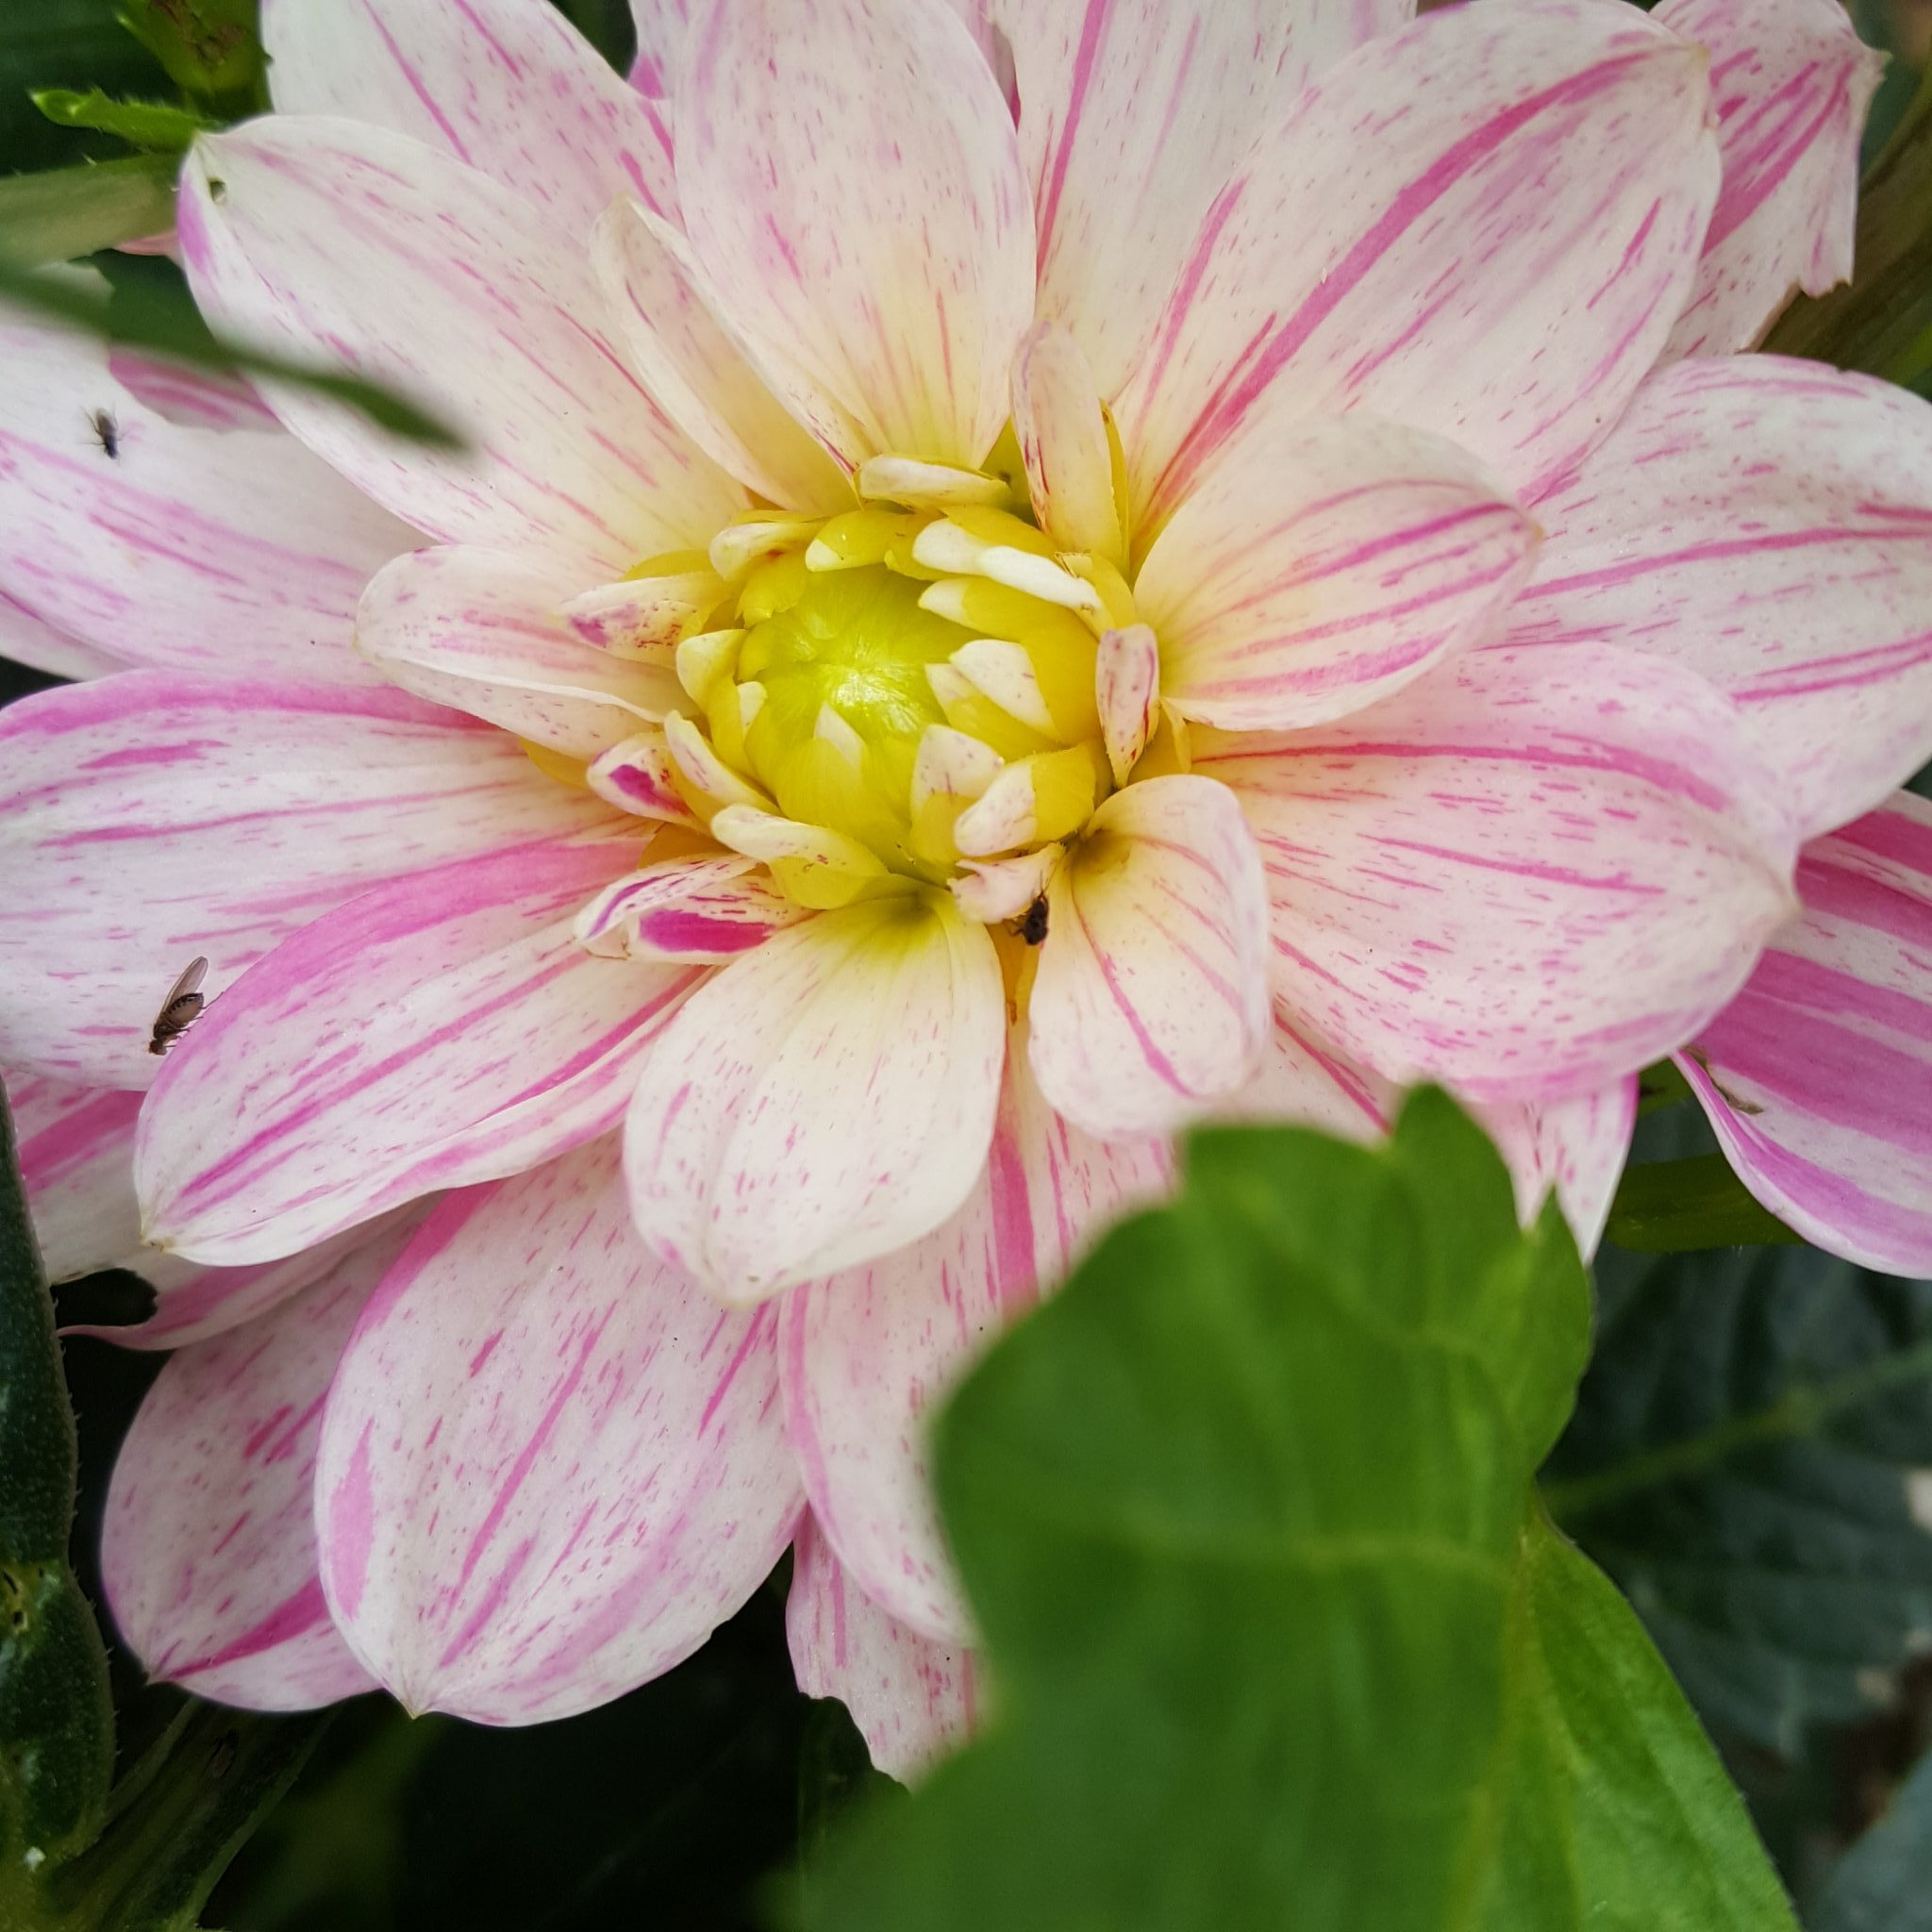 Grow | Of Flowers & Harvests